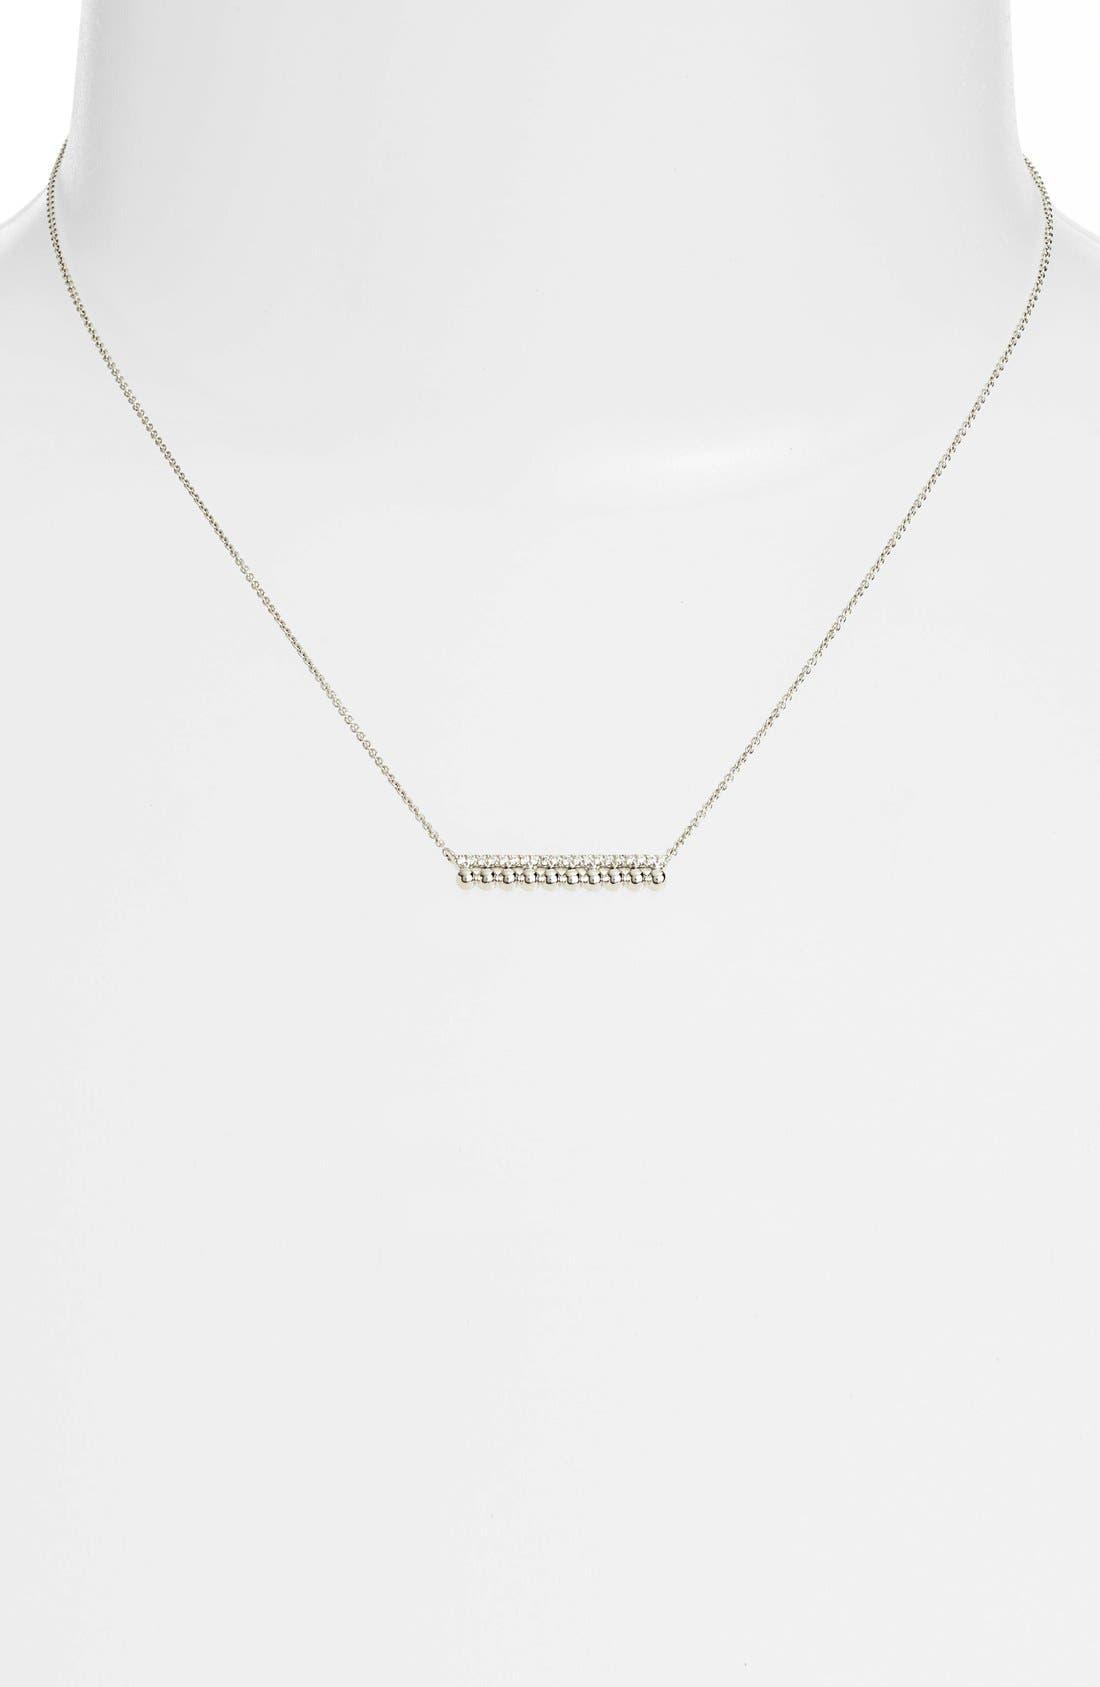 Alternate Image 2  - Dana Rebecca Designs 'Poppy Rae' Bar Pendant Necklace